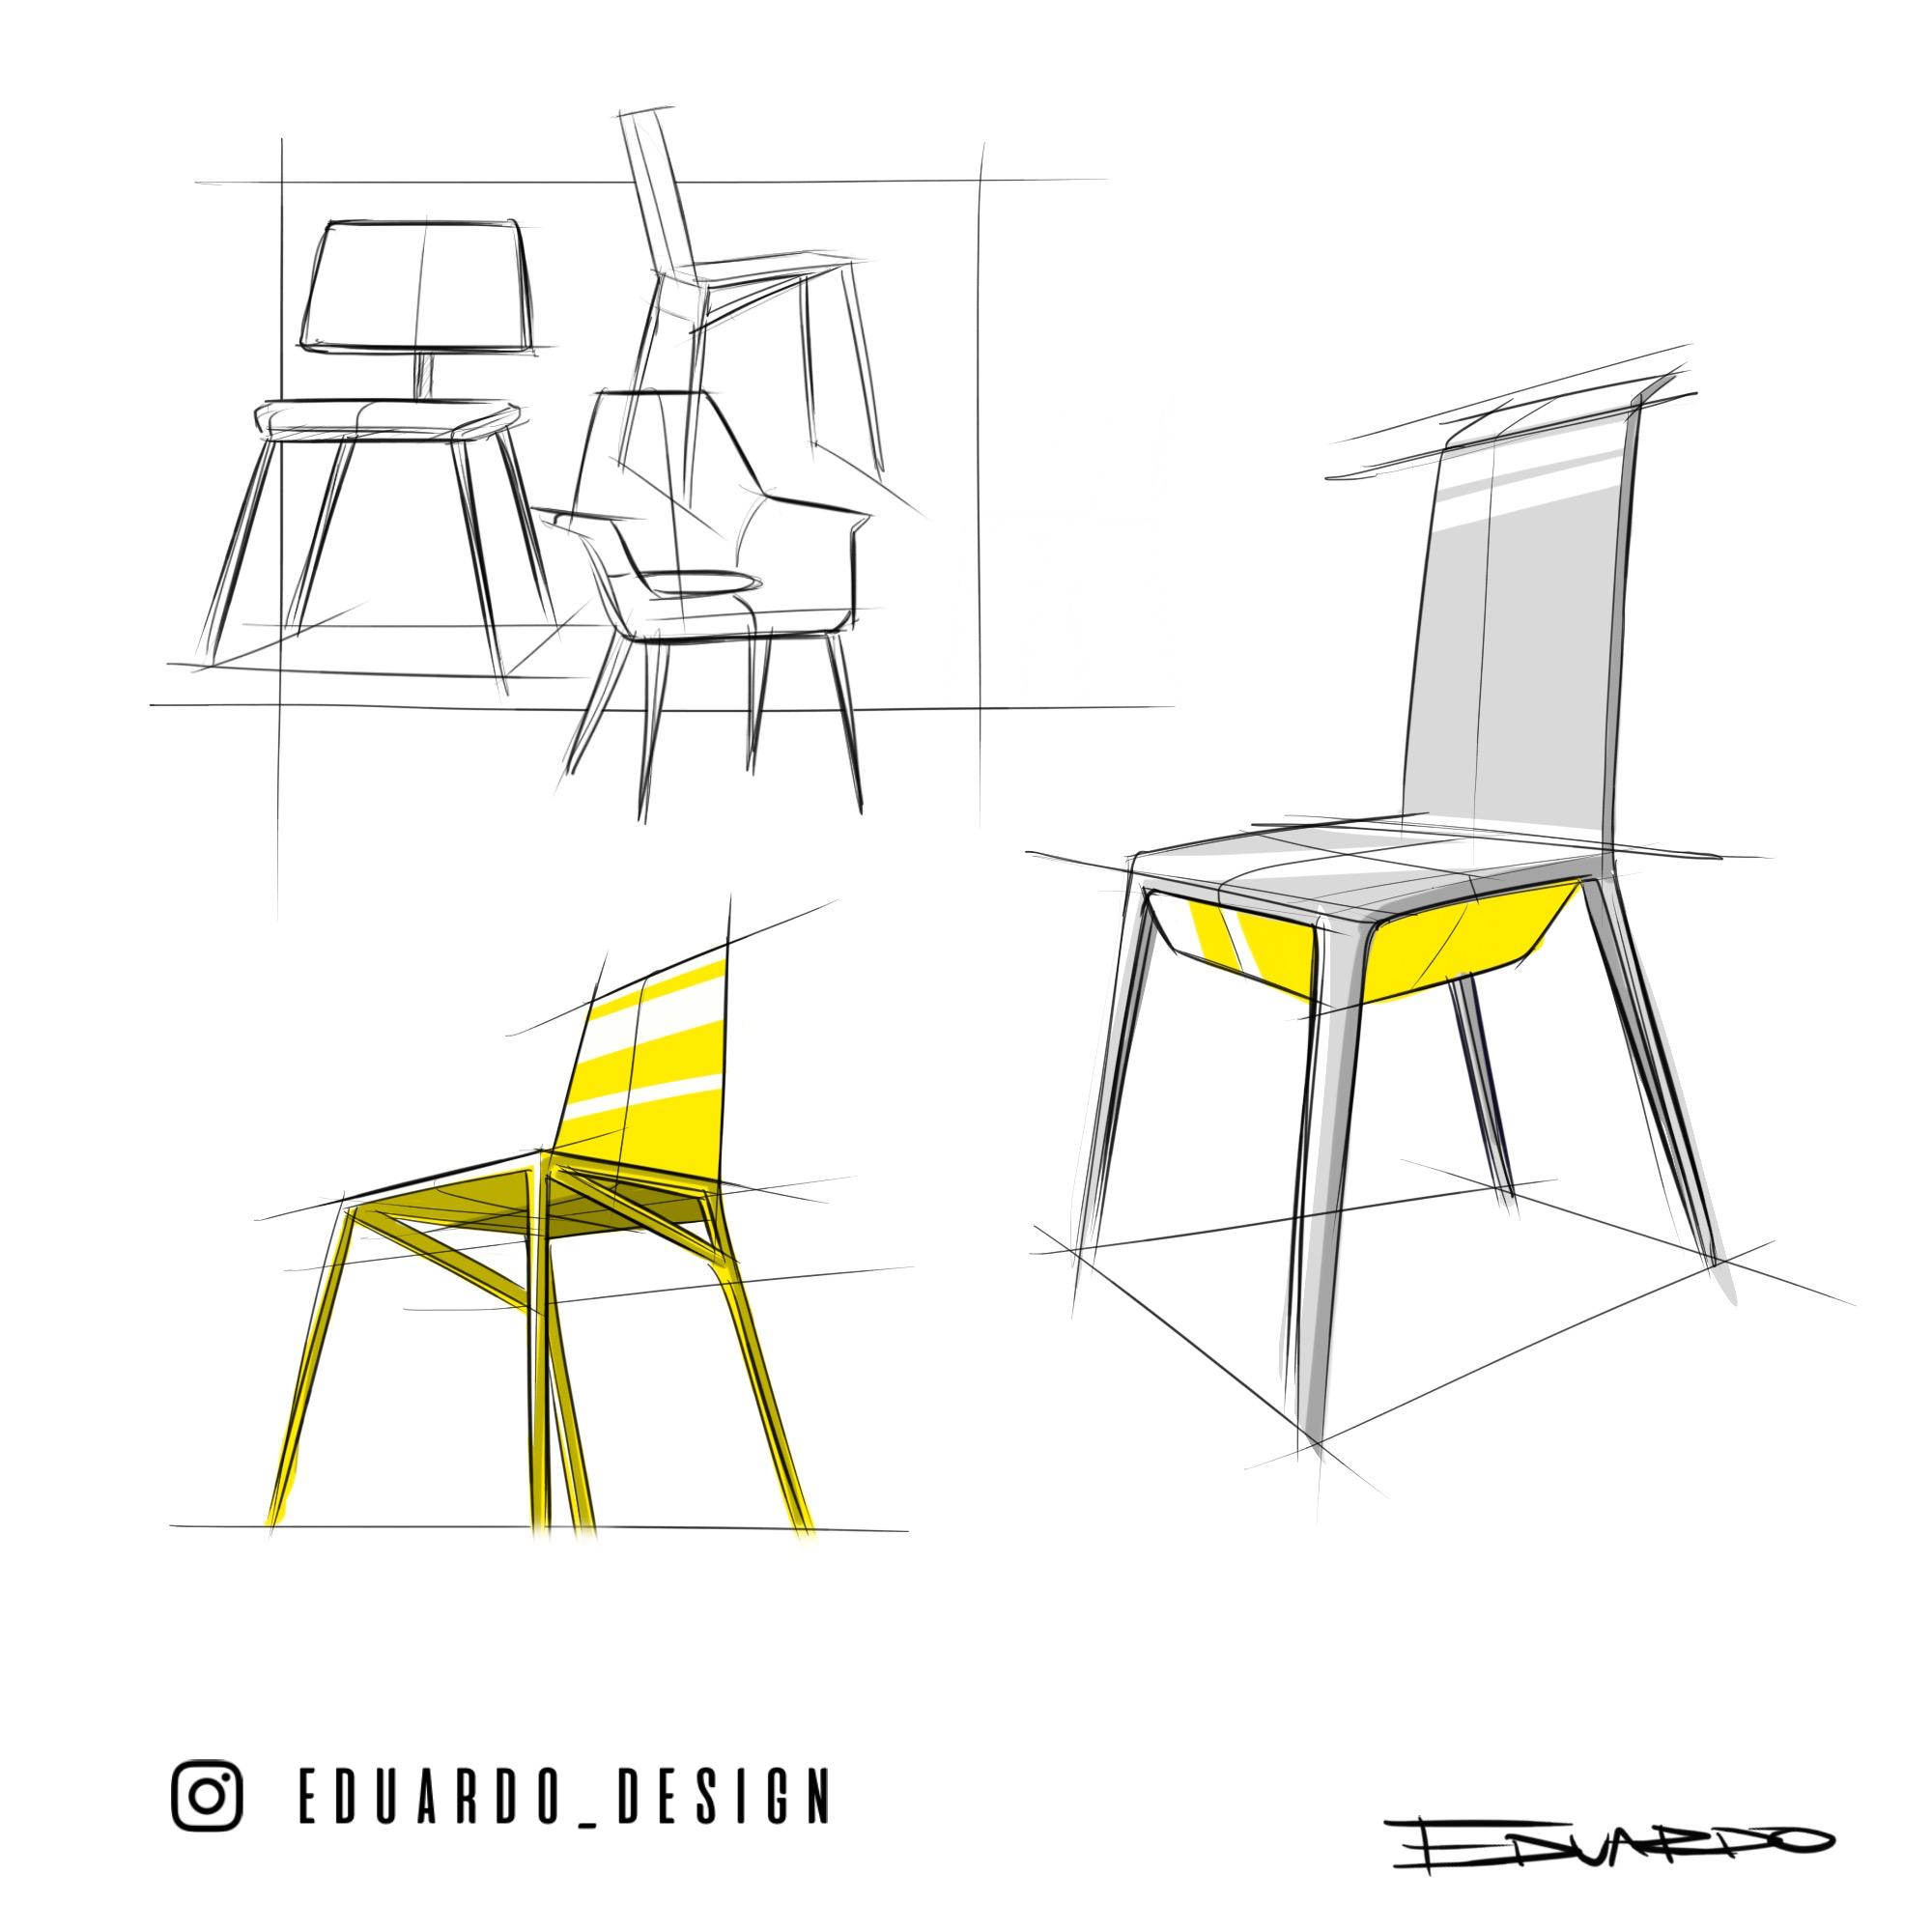 Industrial design sketches furniture - Furniture Design Sketch Concepts Id Sketch Sketchbook Sketches Product Design Industrial